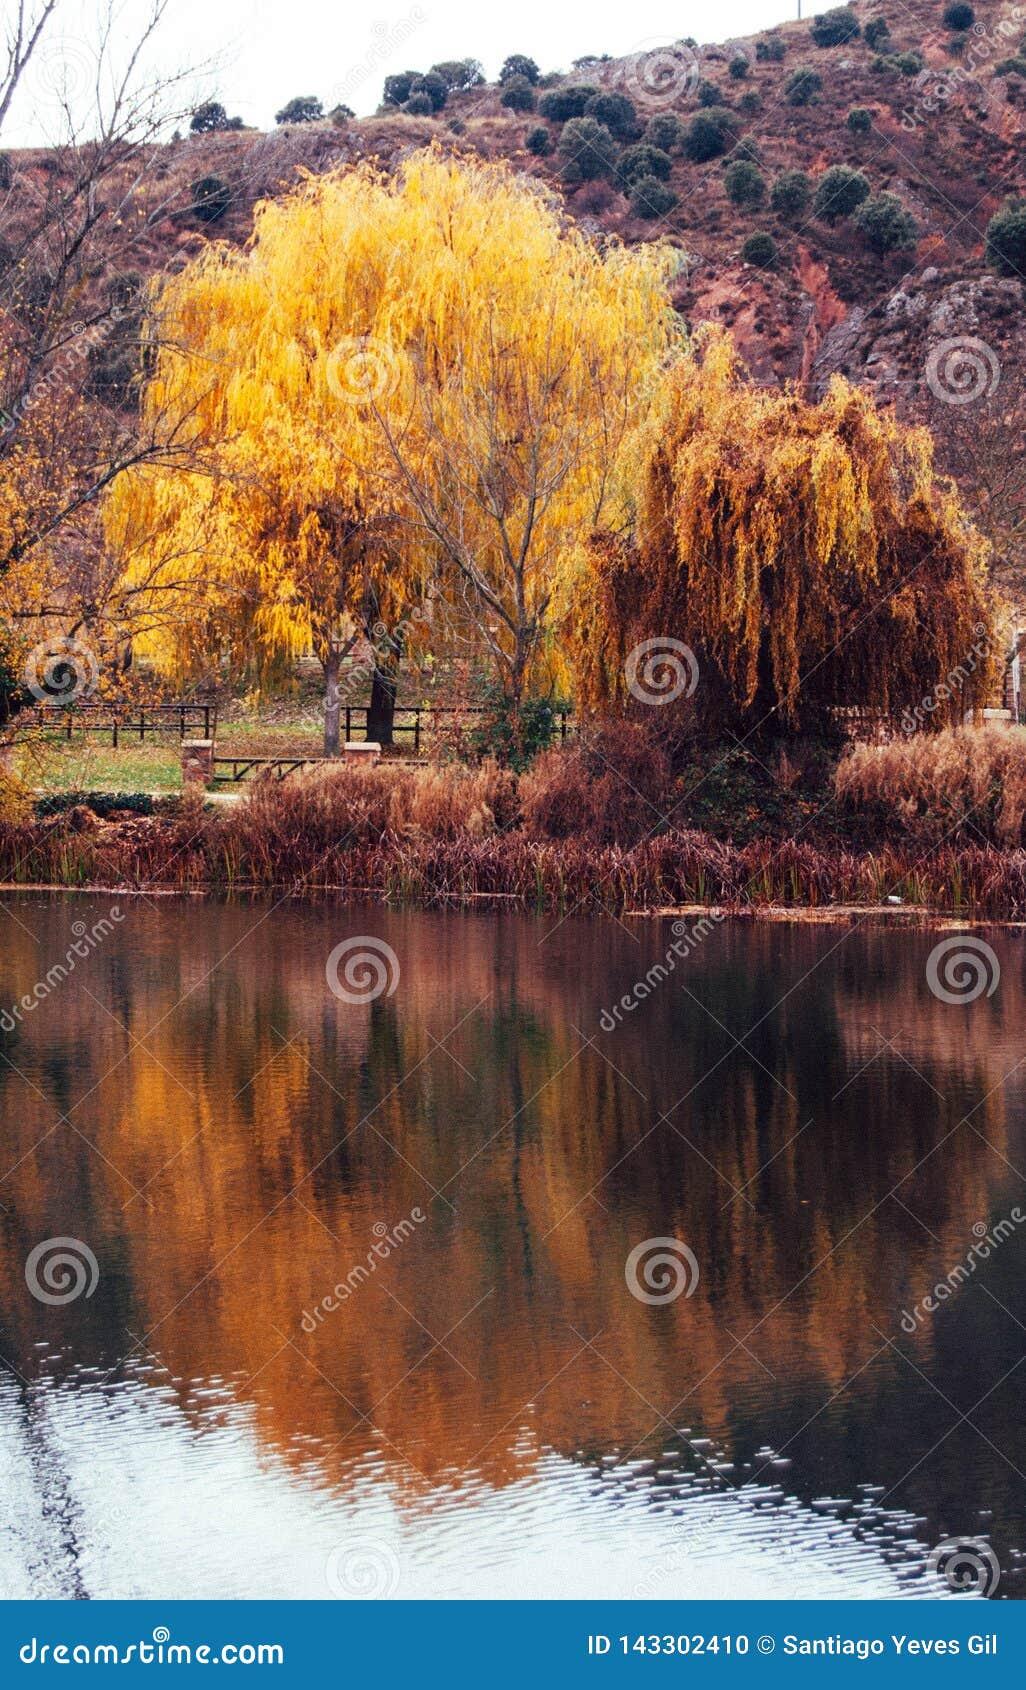 Golden tree next to Duero river